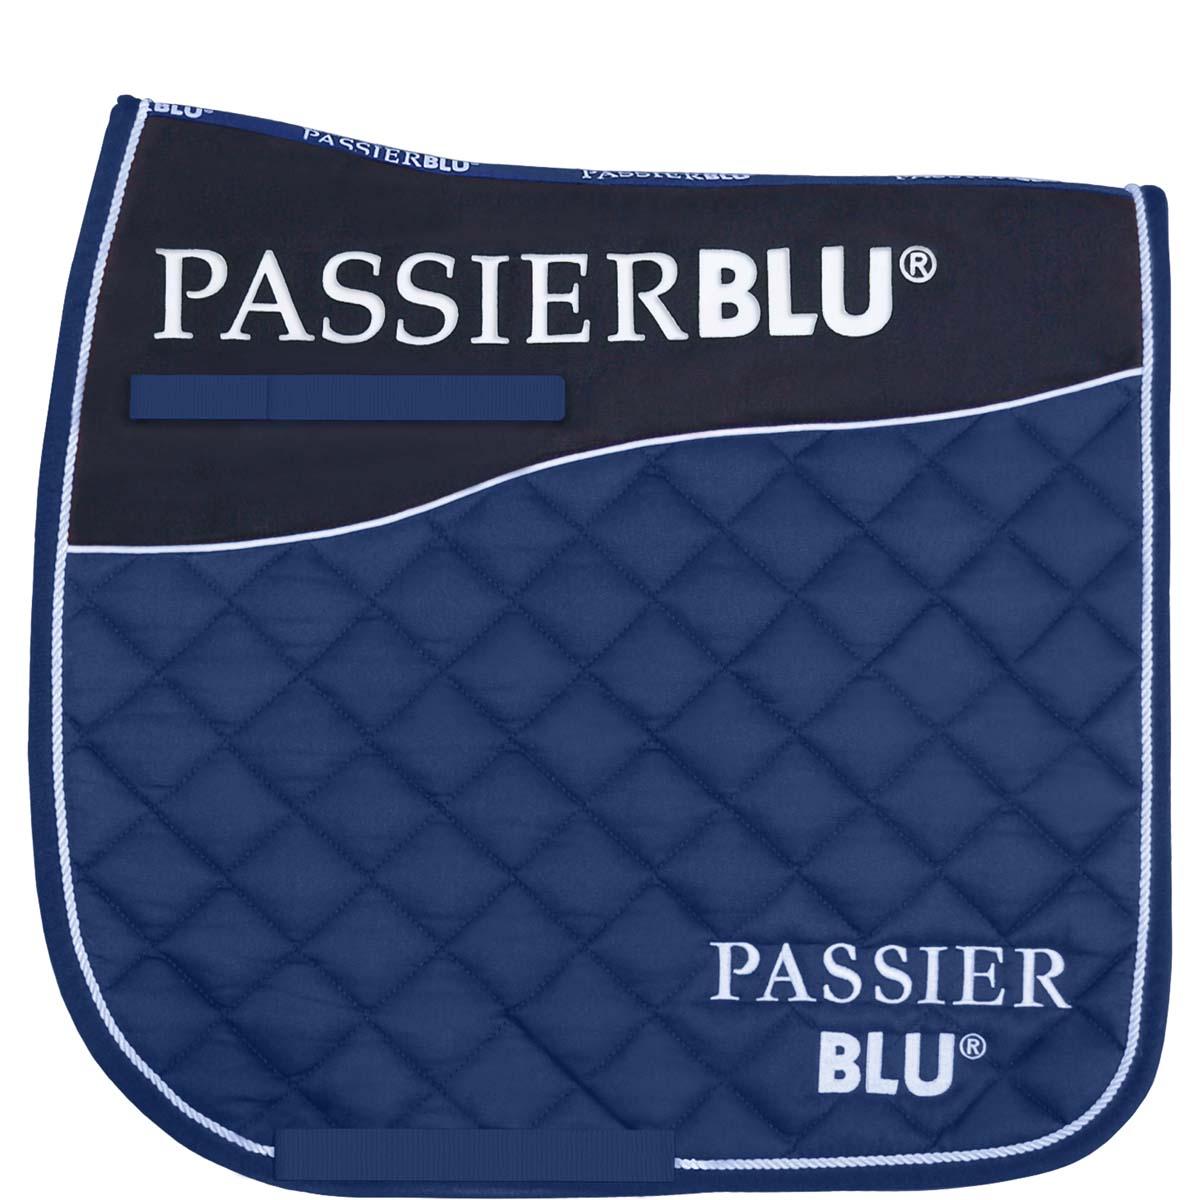 Passier BLU zadeldek blauw maat:dr full